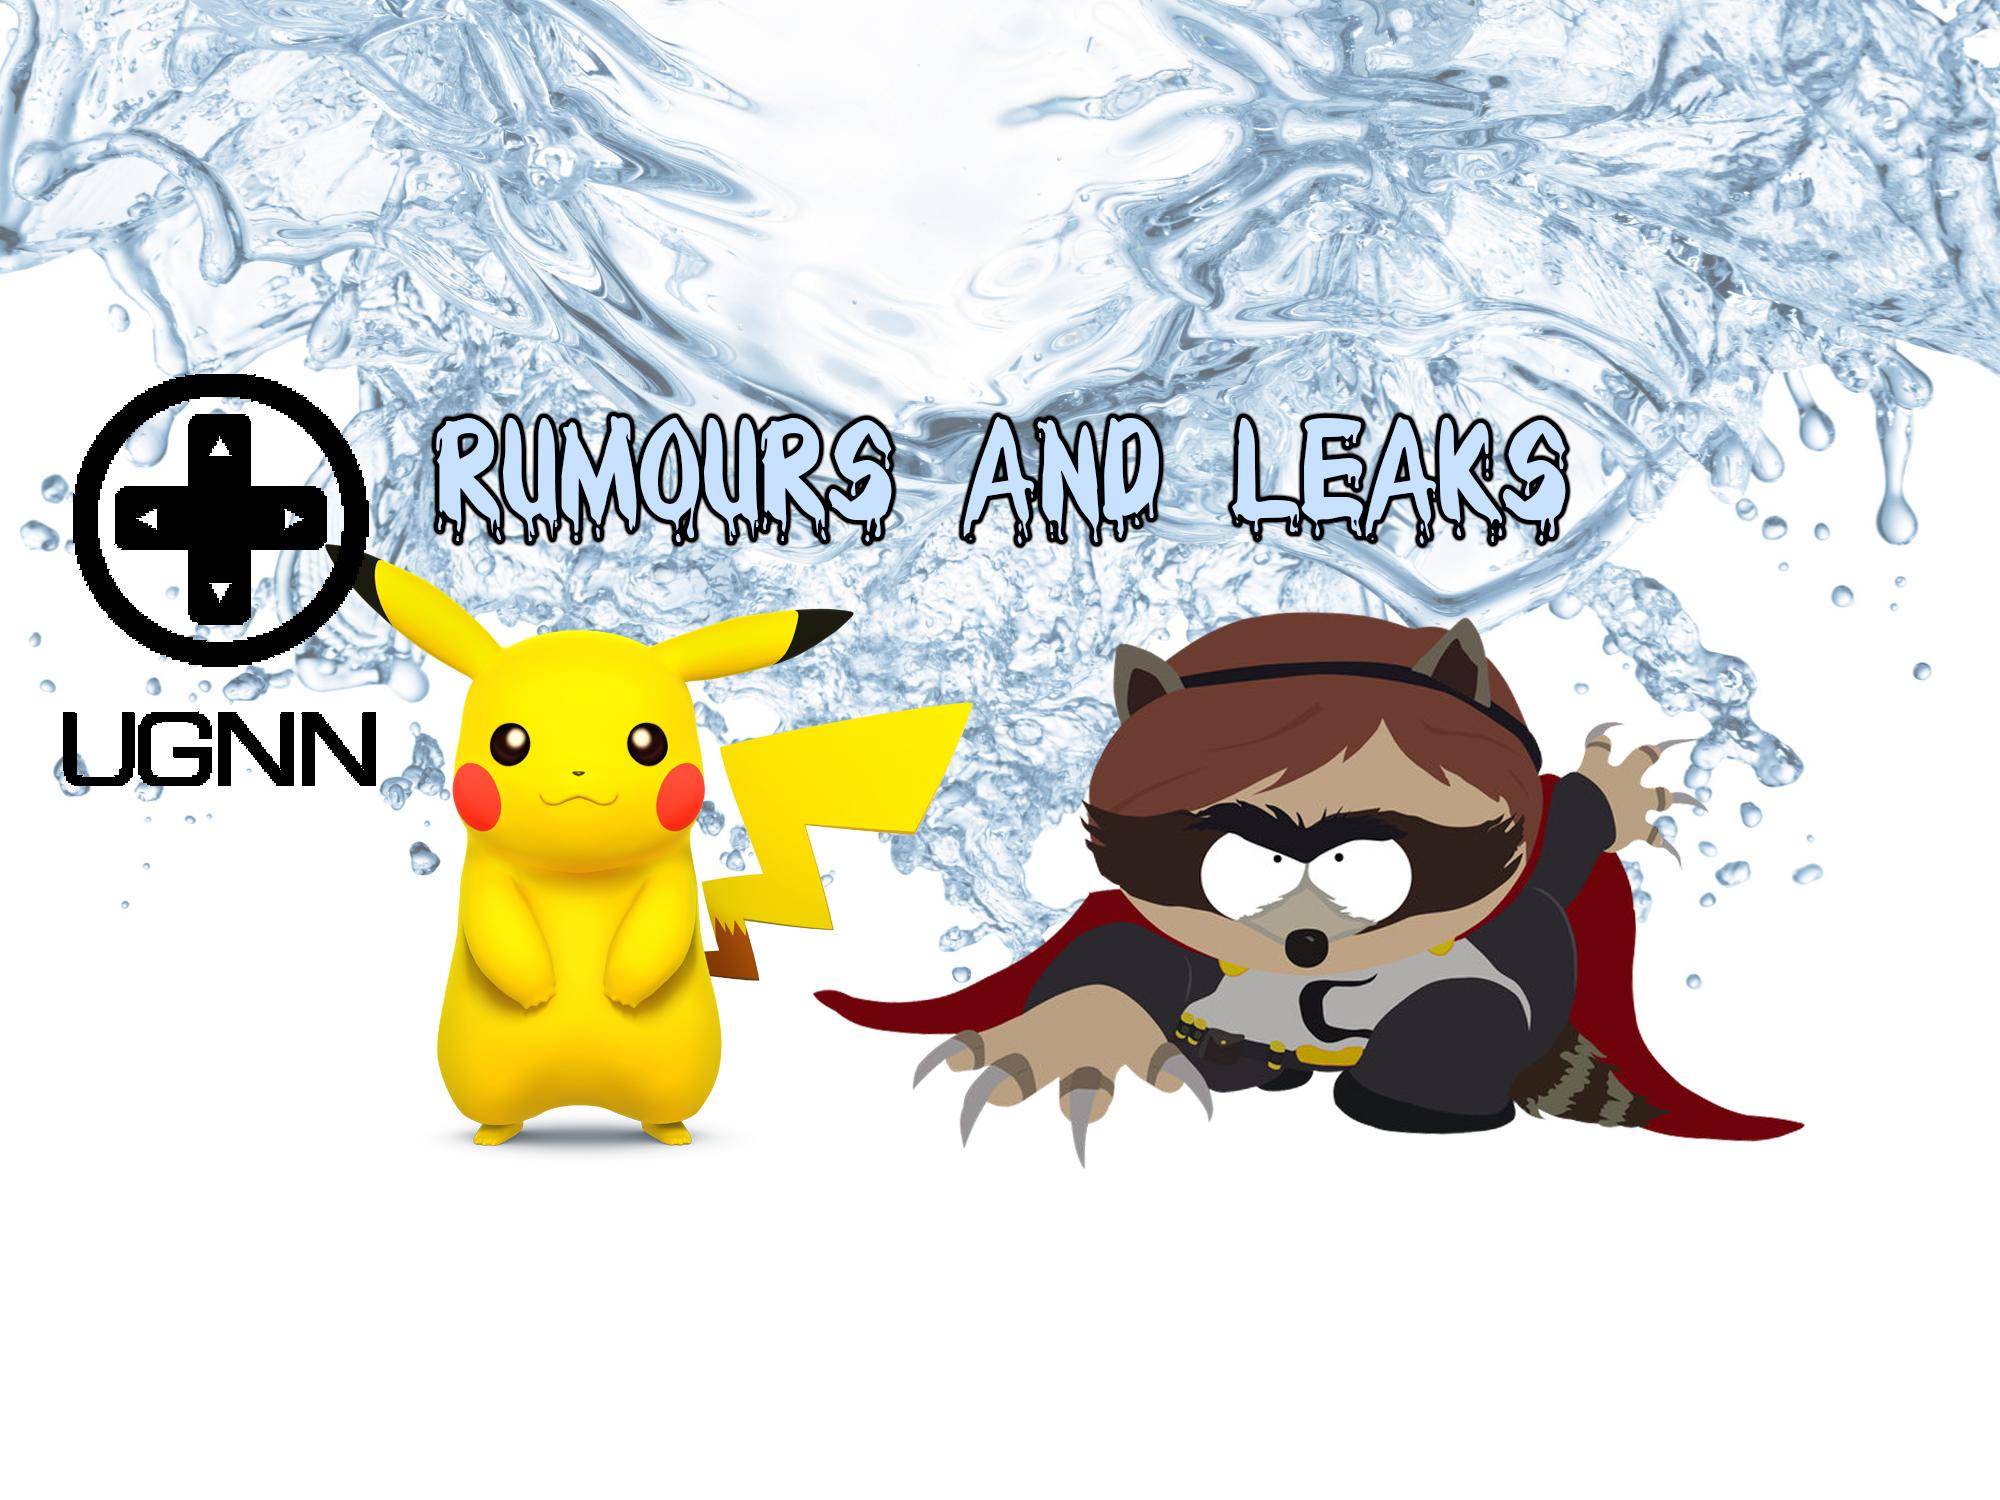 ugnn-rumours-leaks